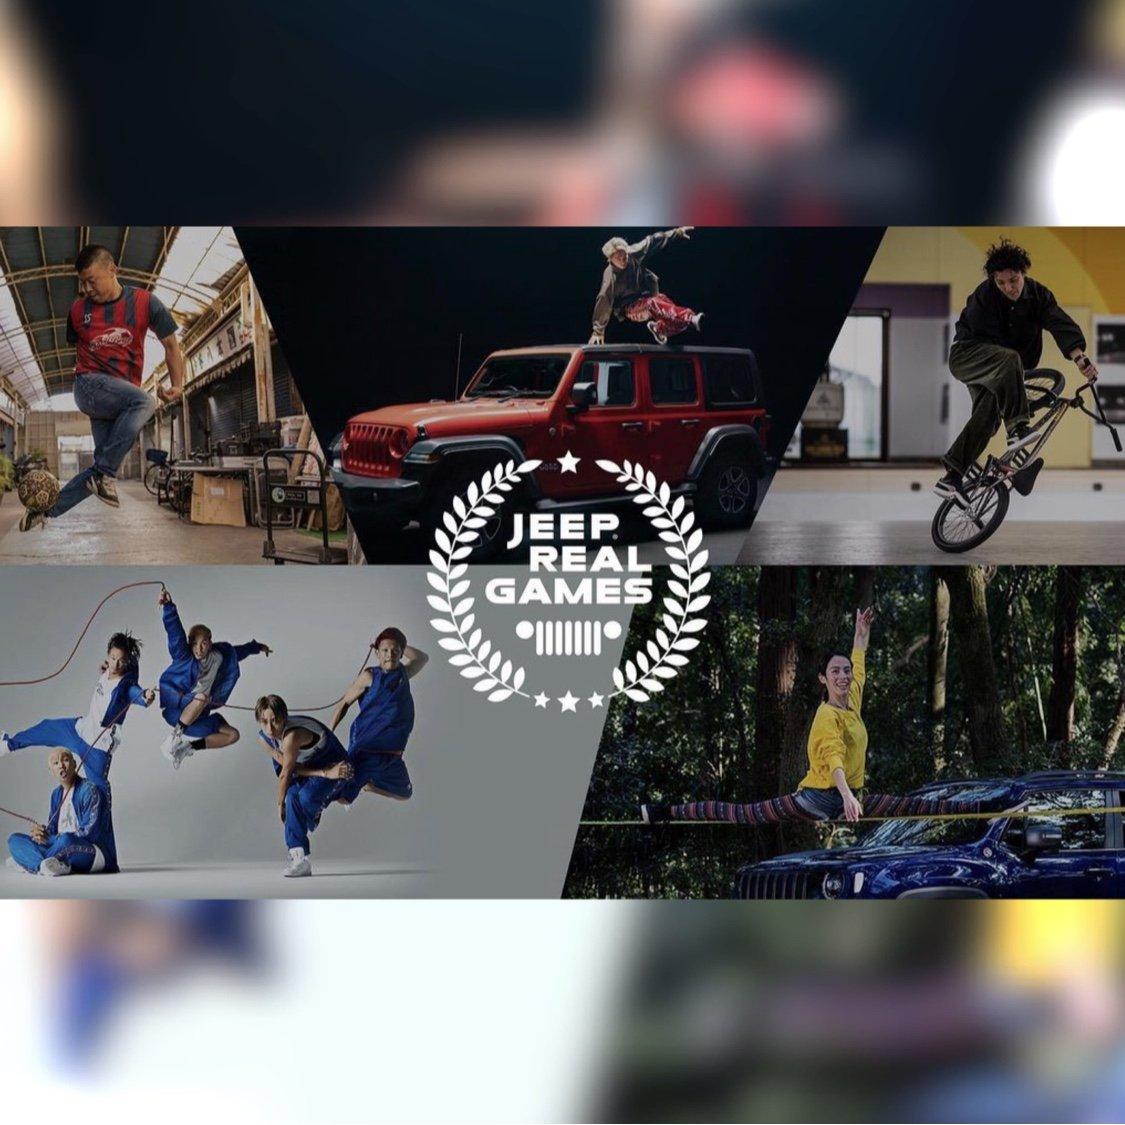 Jeep主催の大会がオンラインで開催|Jeep Real Games 2020